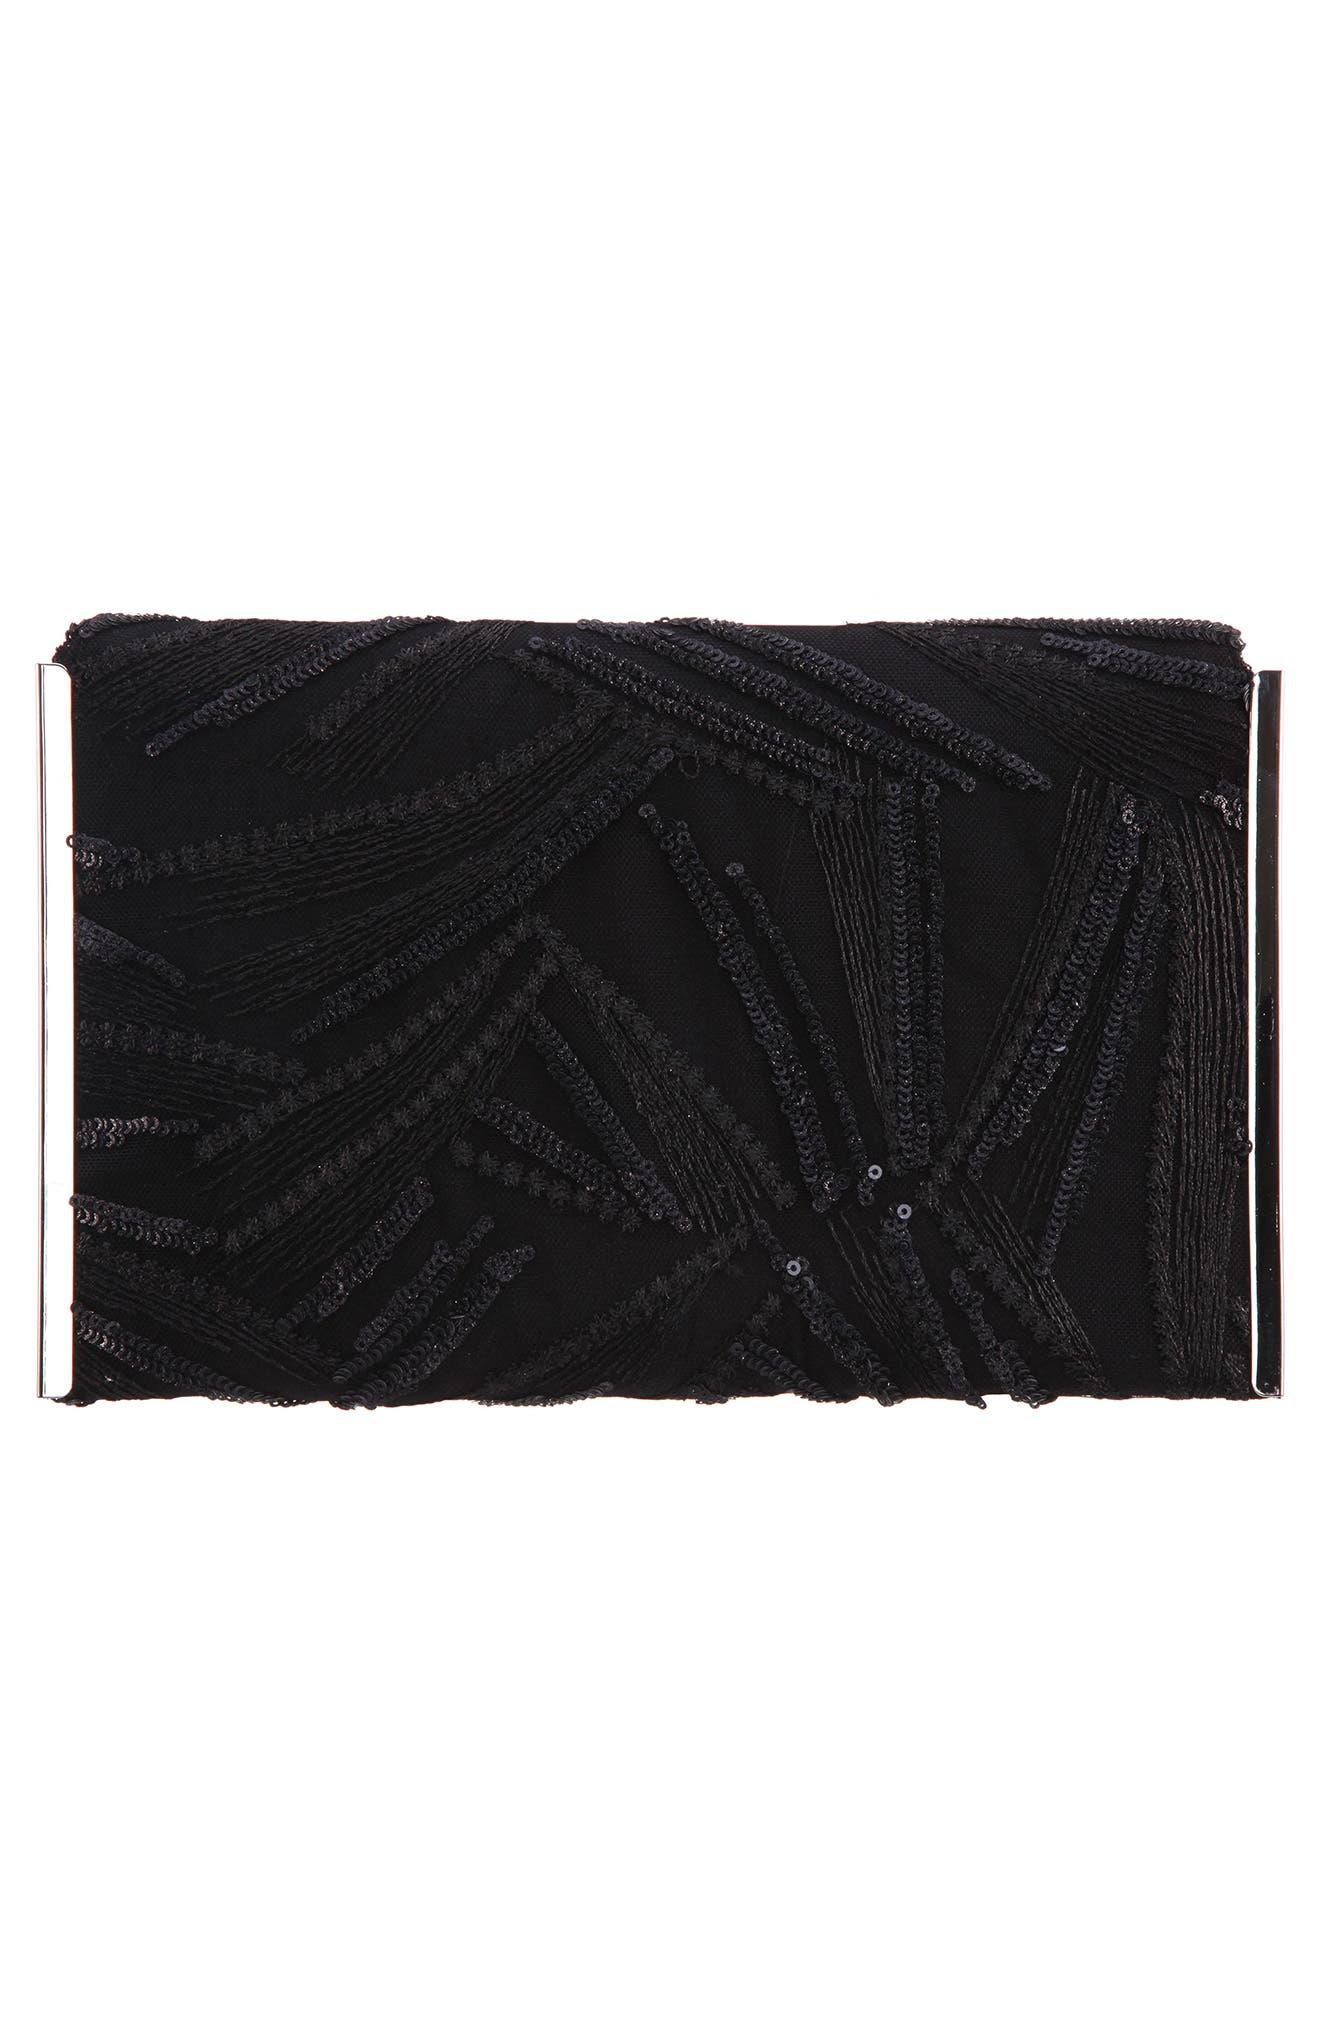 Embroidery Envelope Clutch Bag,                             Alternate thumbnail 2, color,                             BLACK